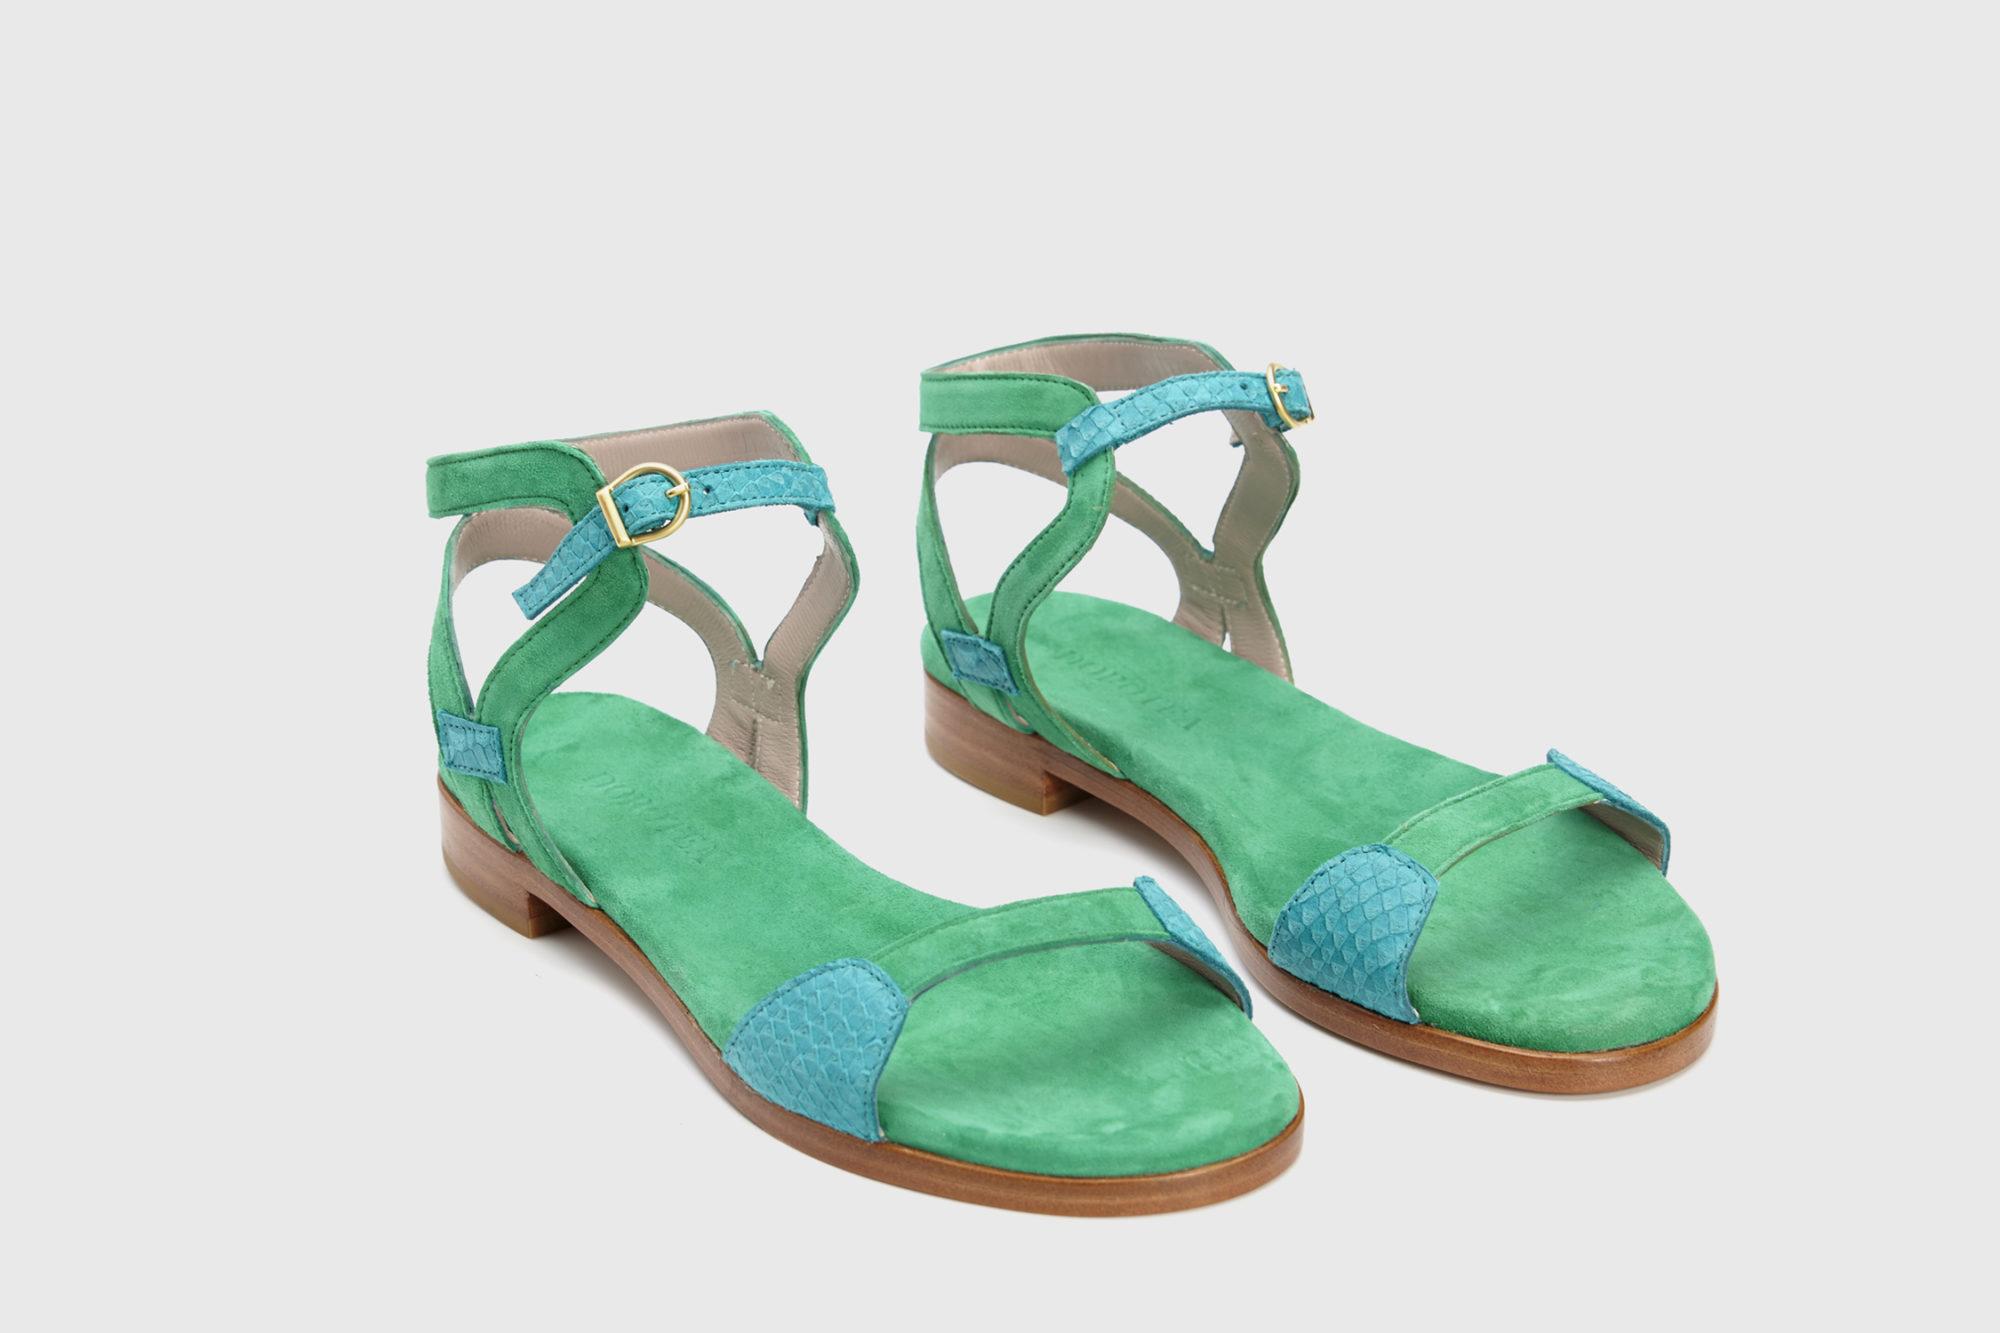 Dorotea sandalia plana Maya turquesa verde ss18 par